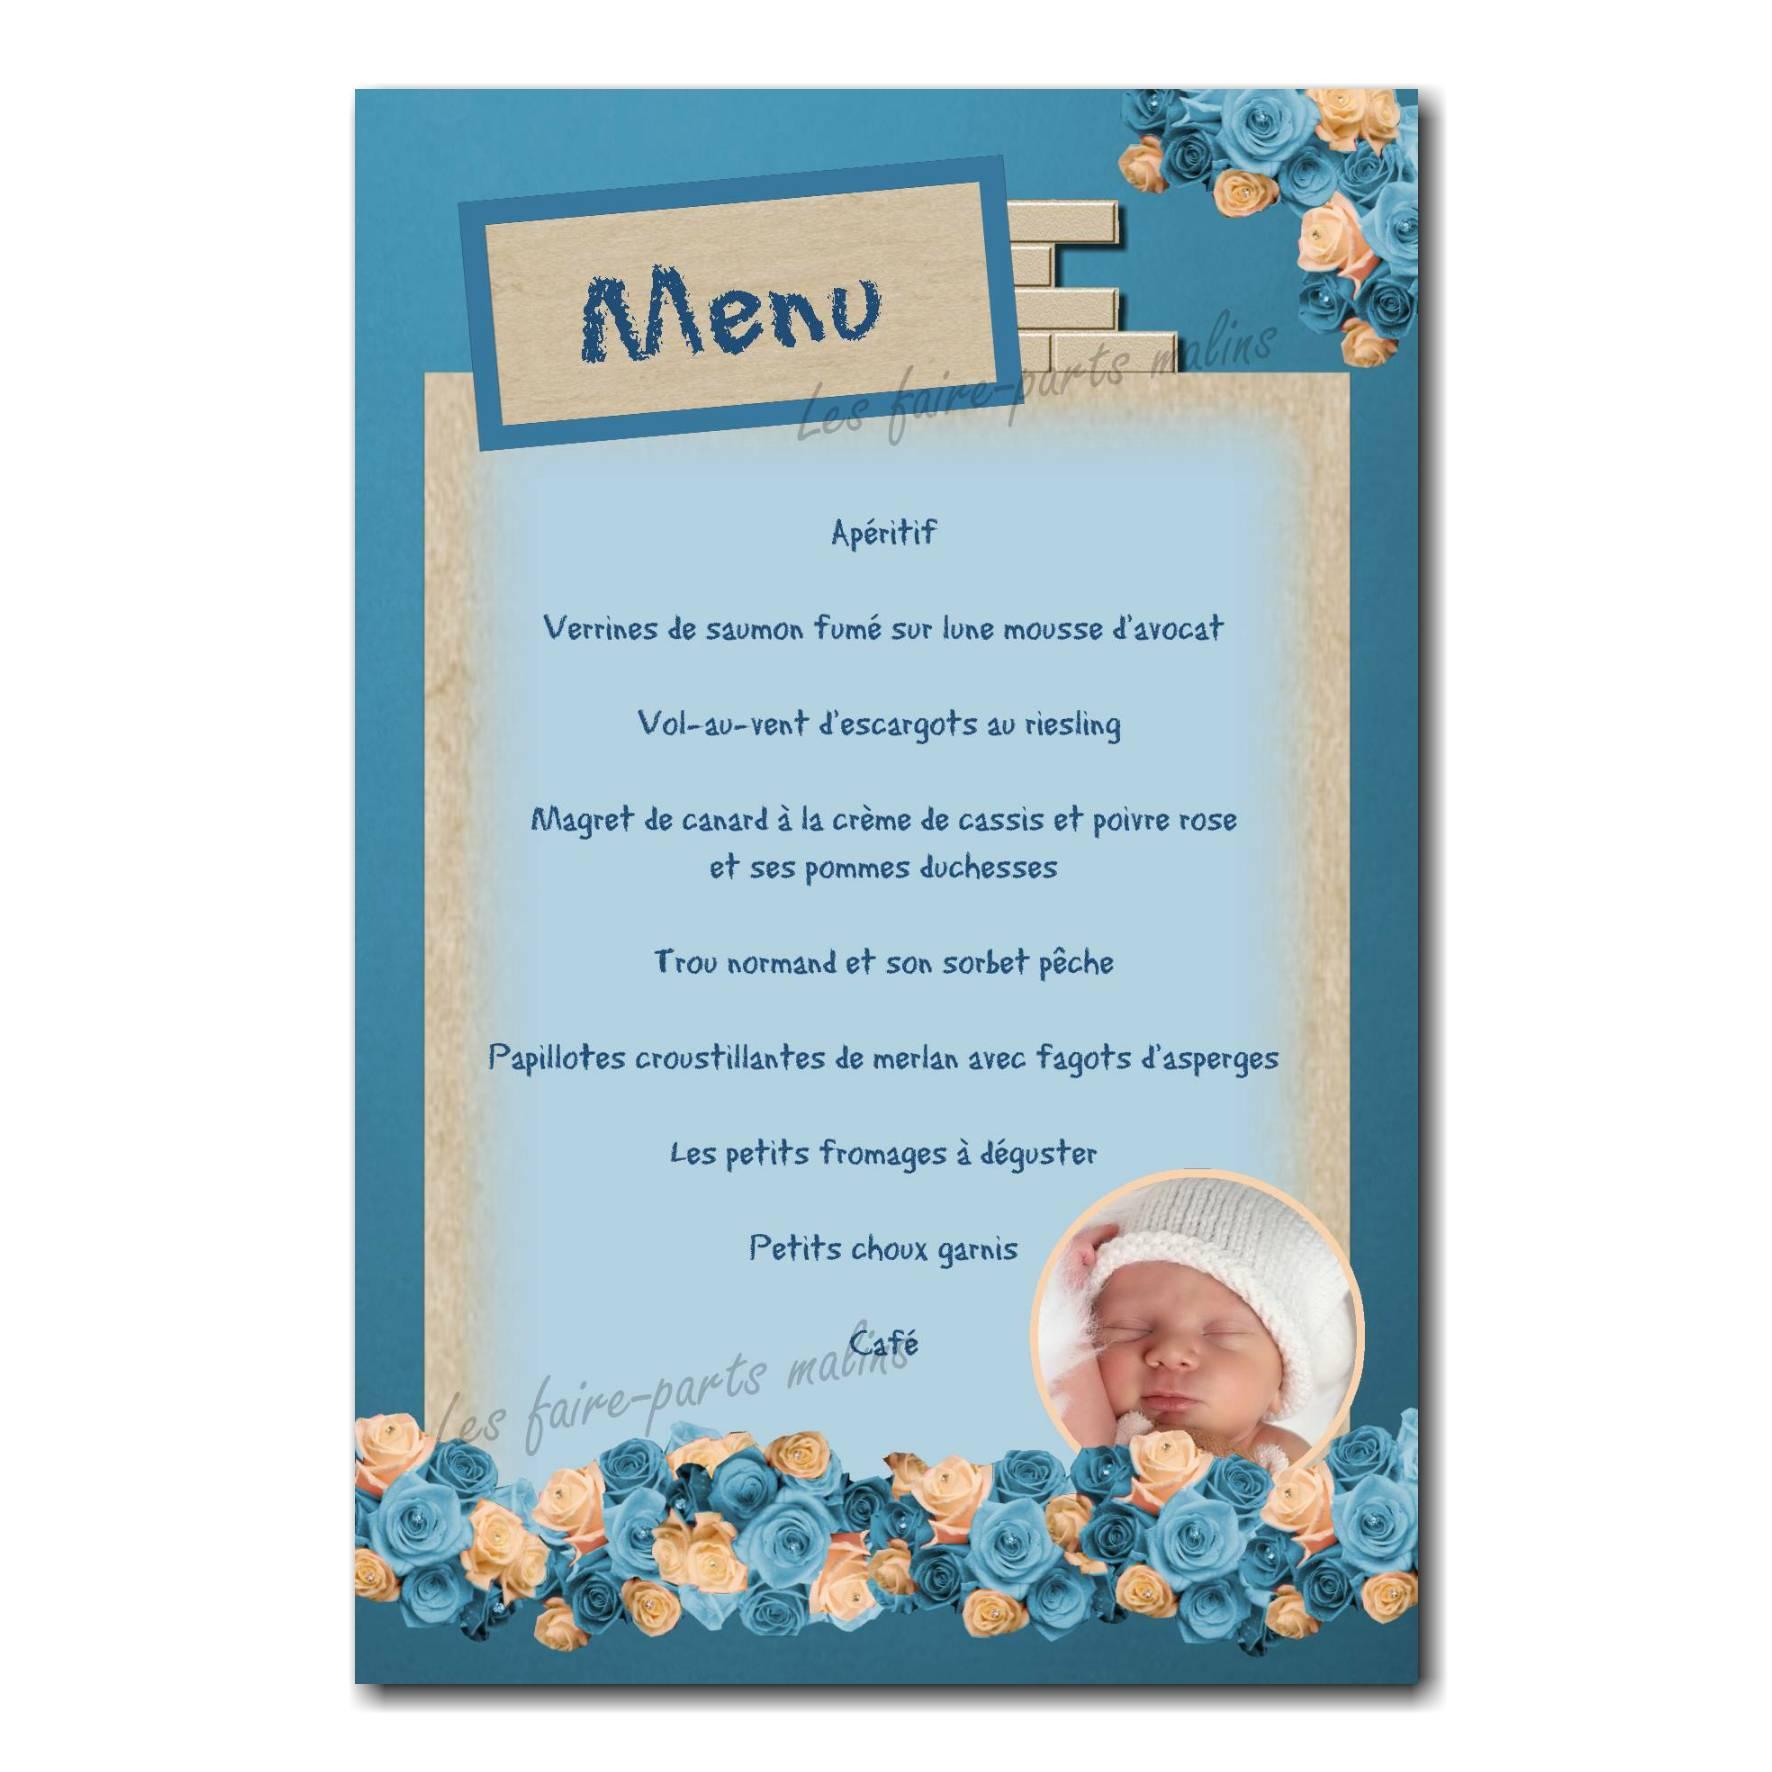 17 garcon menu photo